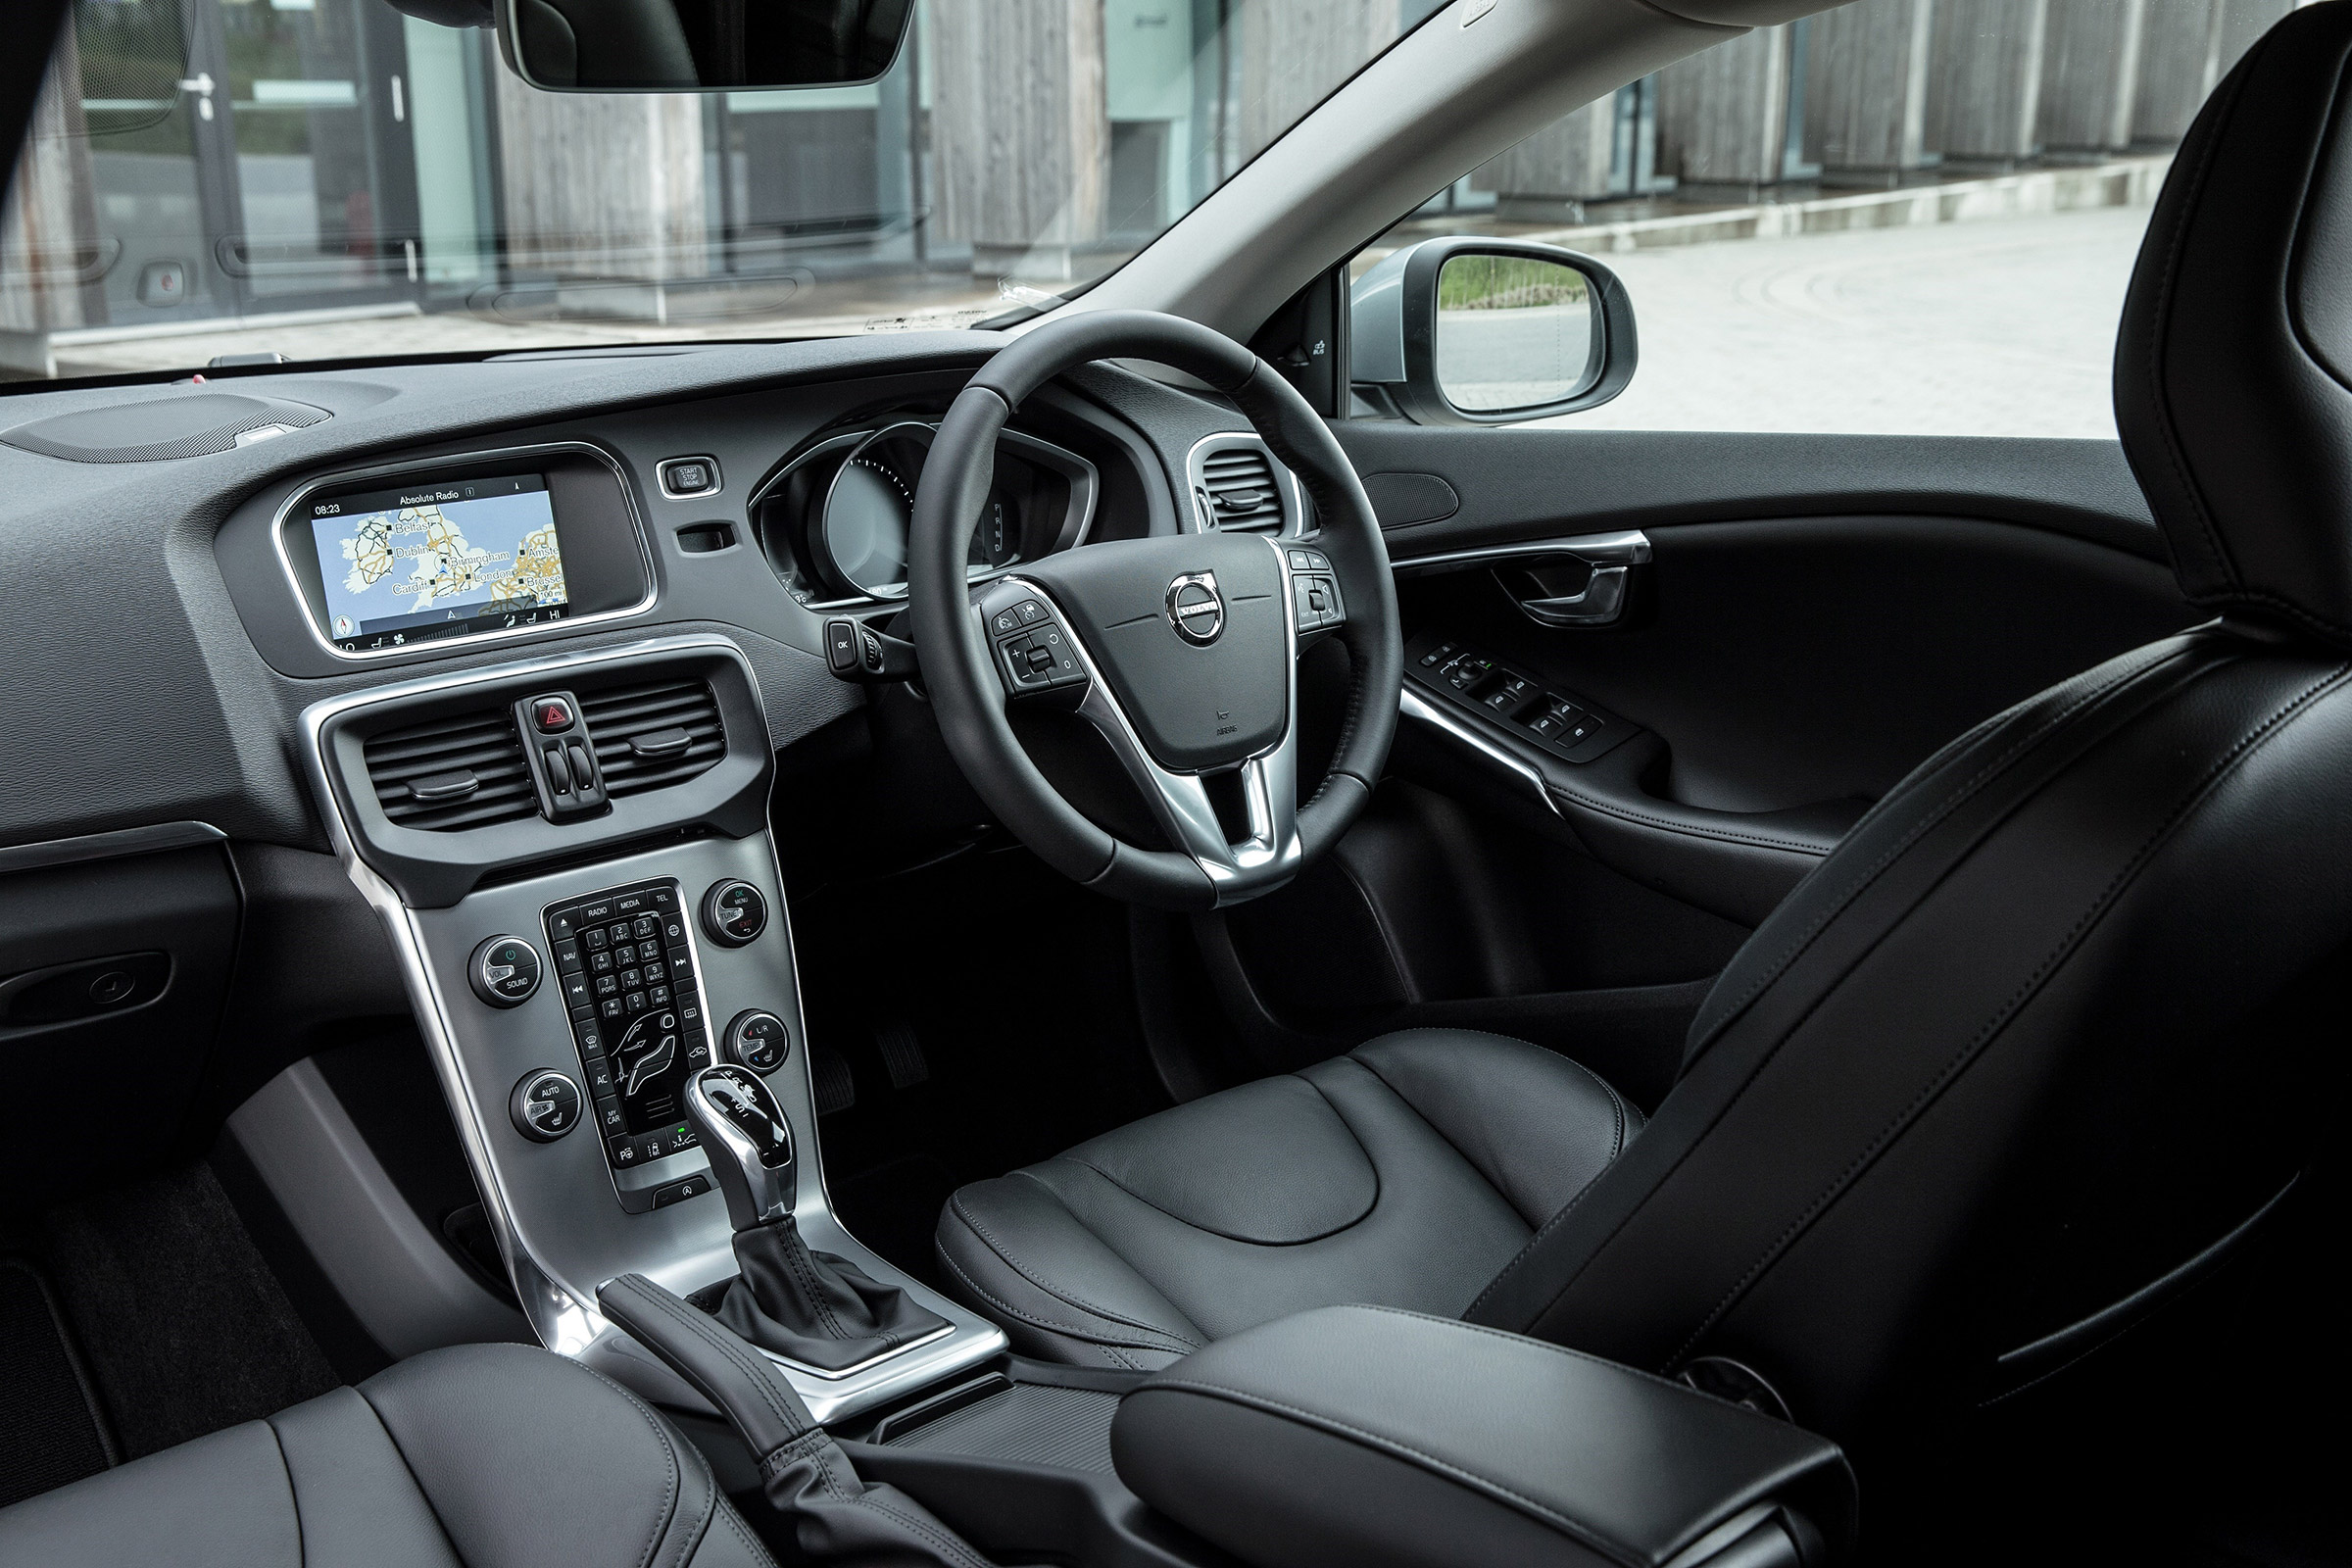 Volvo V40 Interior And Tech Evo